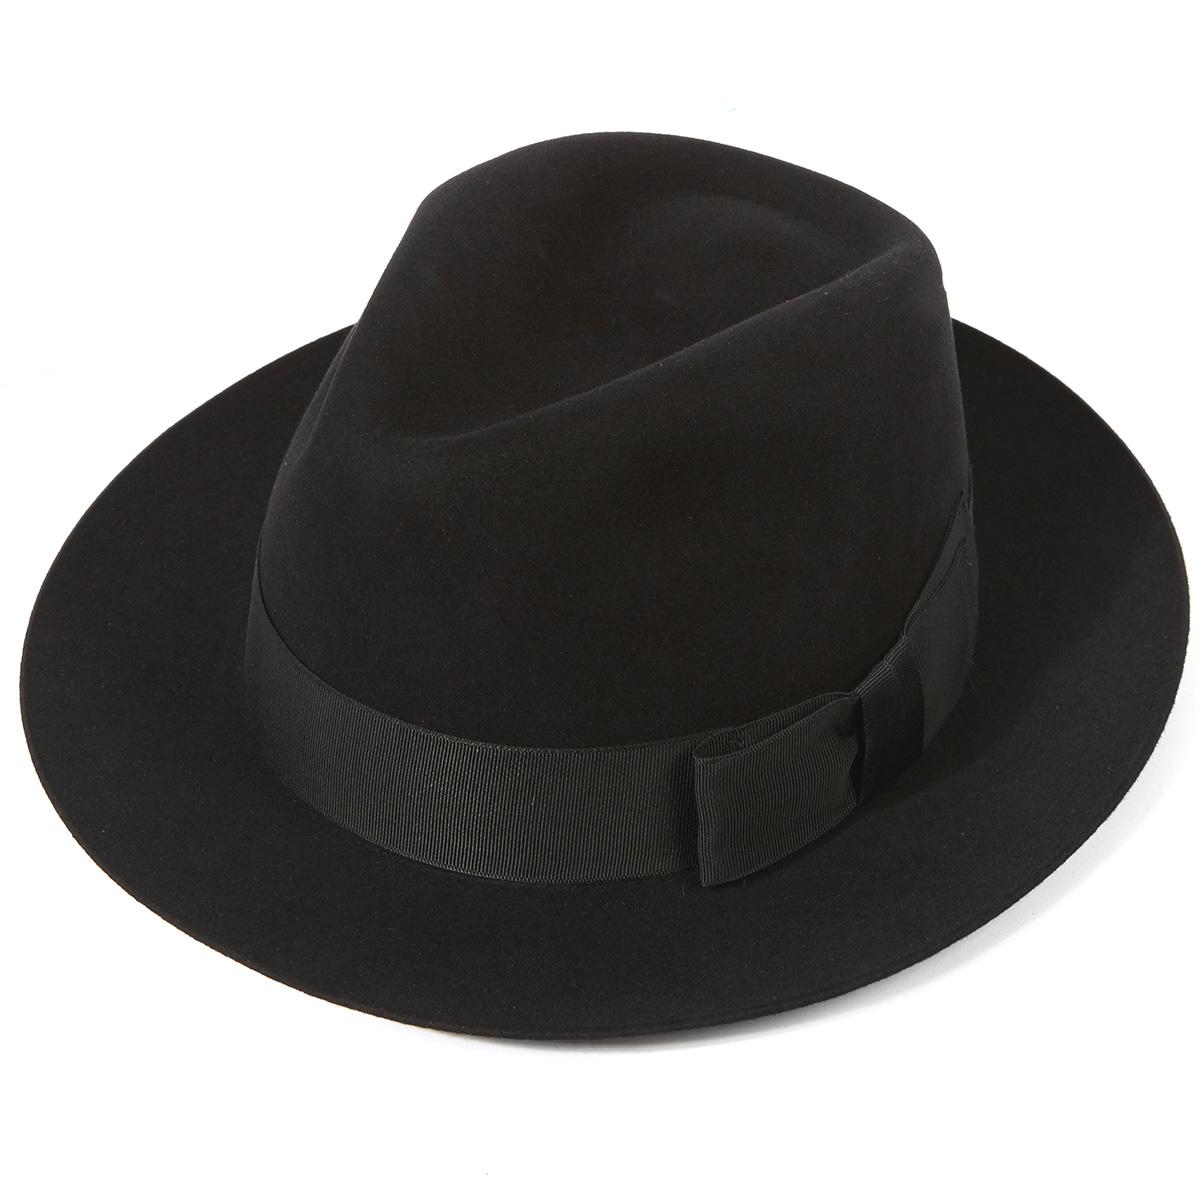 Bond Trilby - Black in size 62